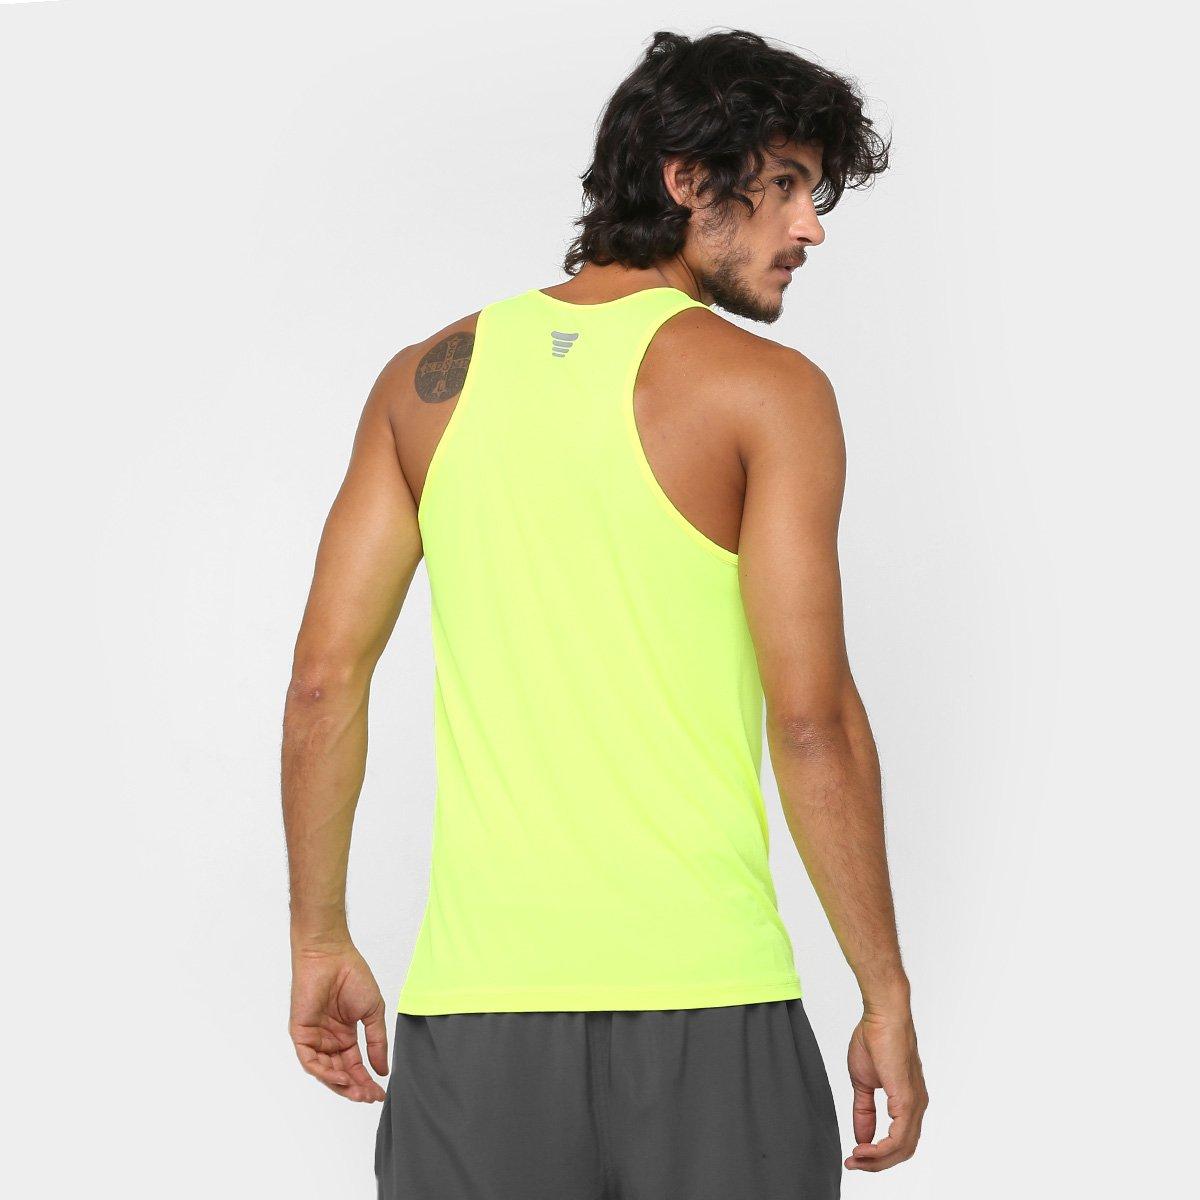 Camiseta Regata Fila Bio  Camiseta Regata Fila Bio ... 59d9111f5a0